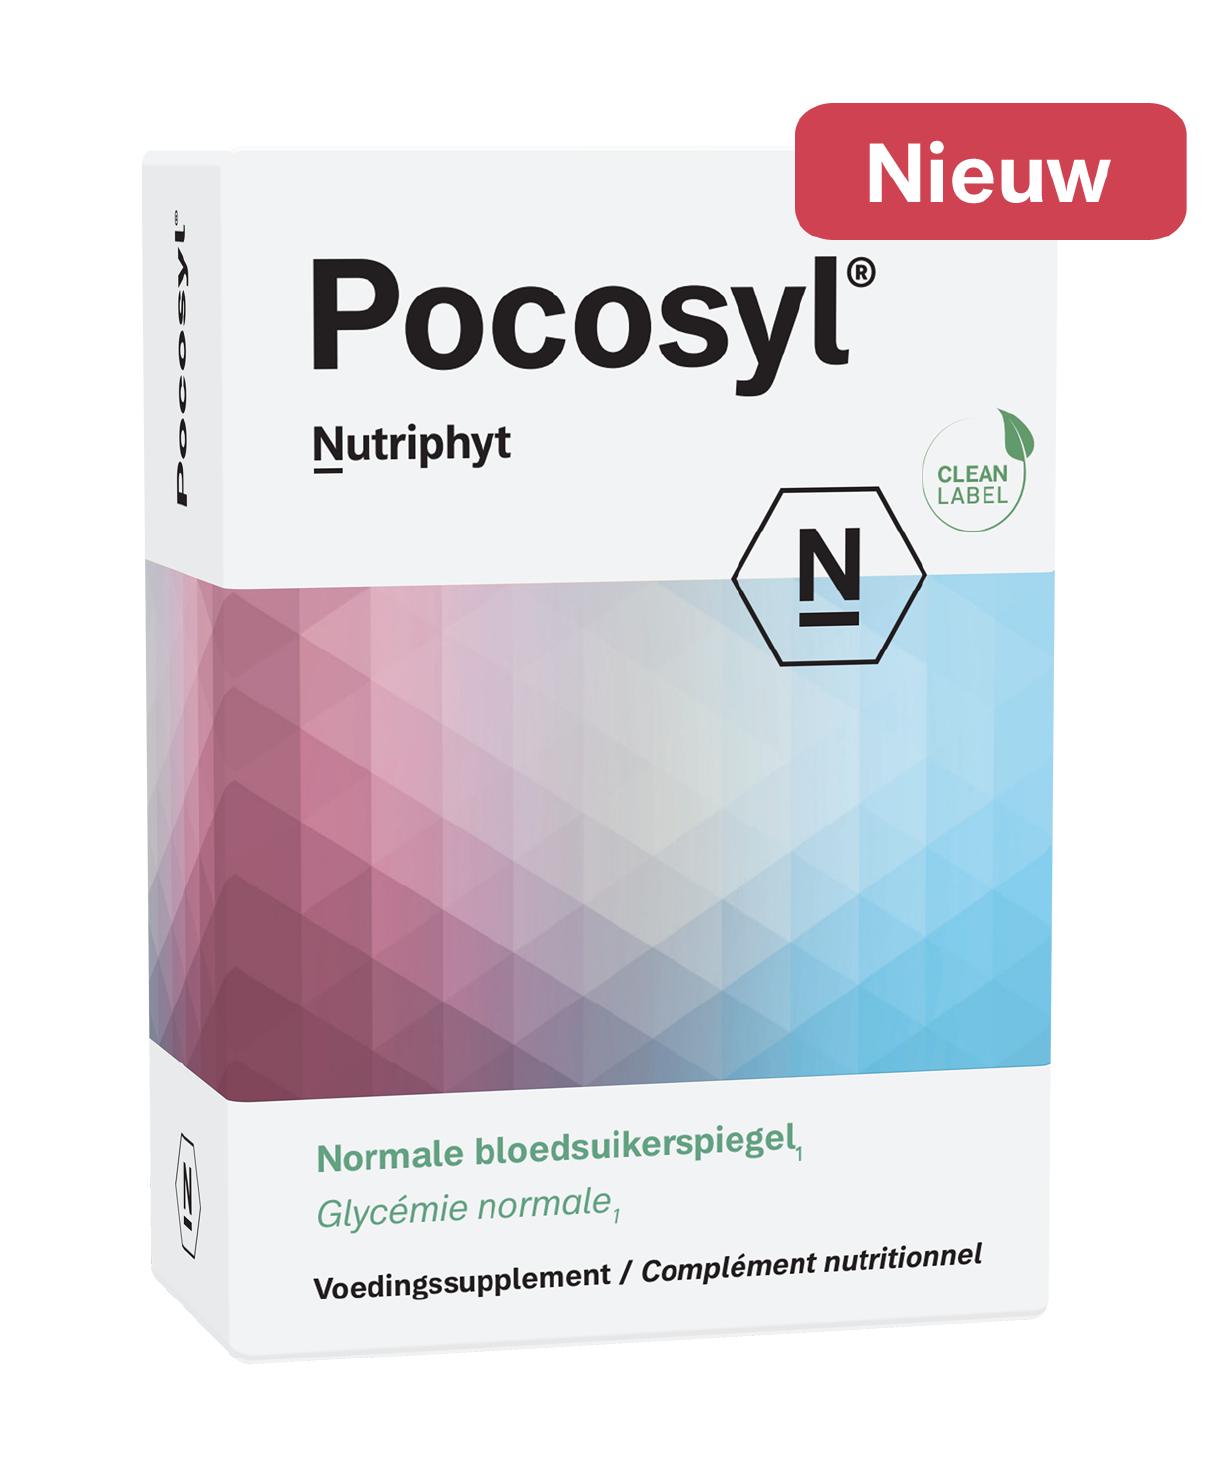 Pocosyl